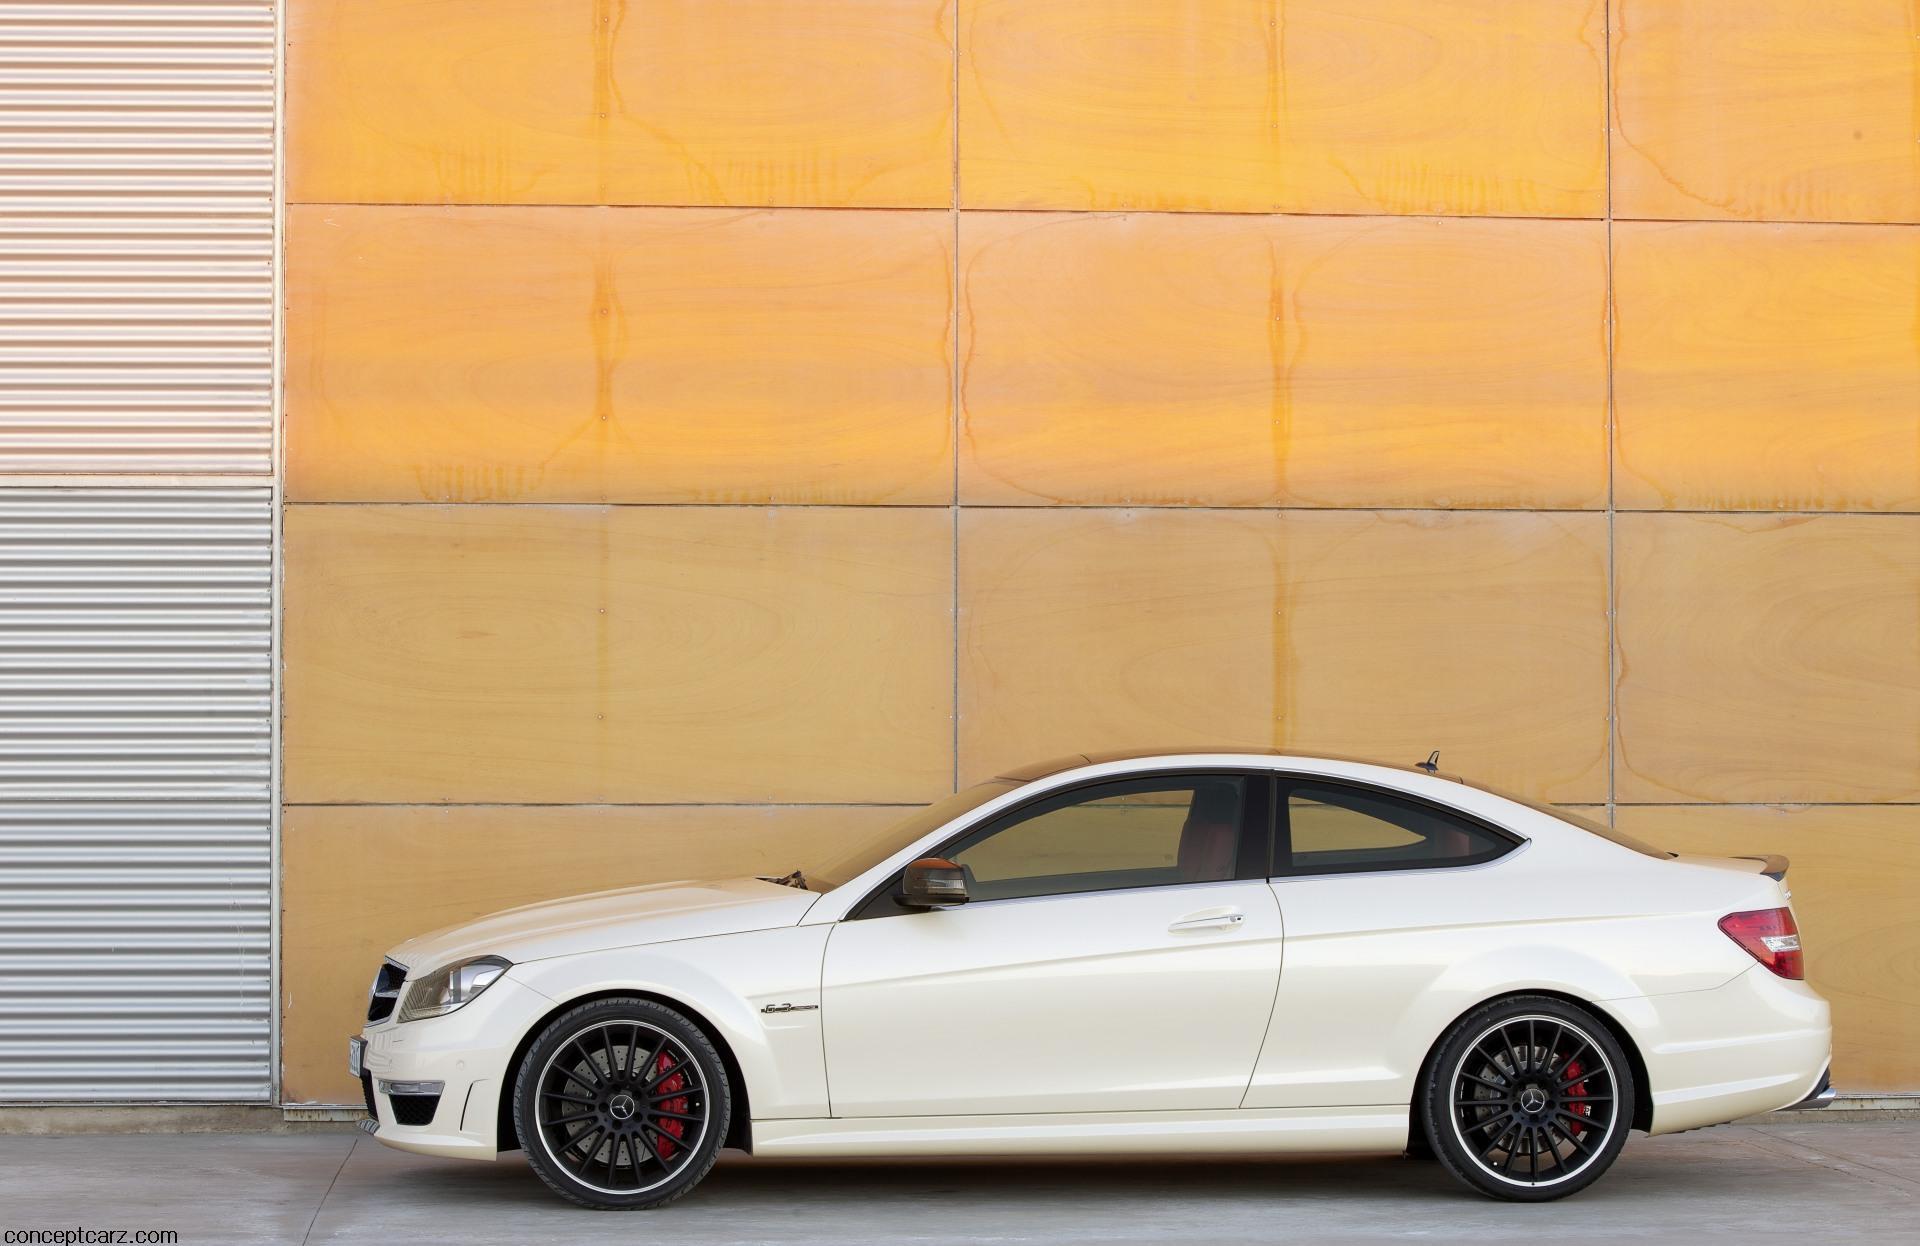 2012 Mercedes-Benz C63 AMG Coupe - conceptcarz.com